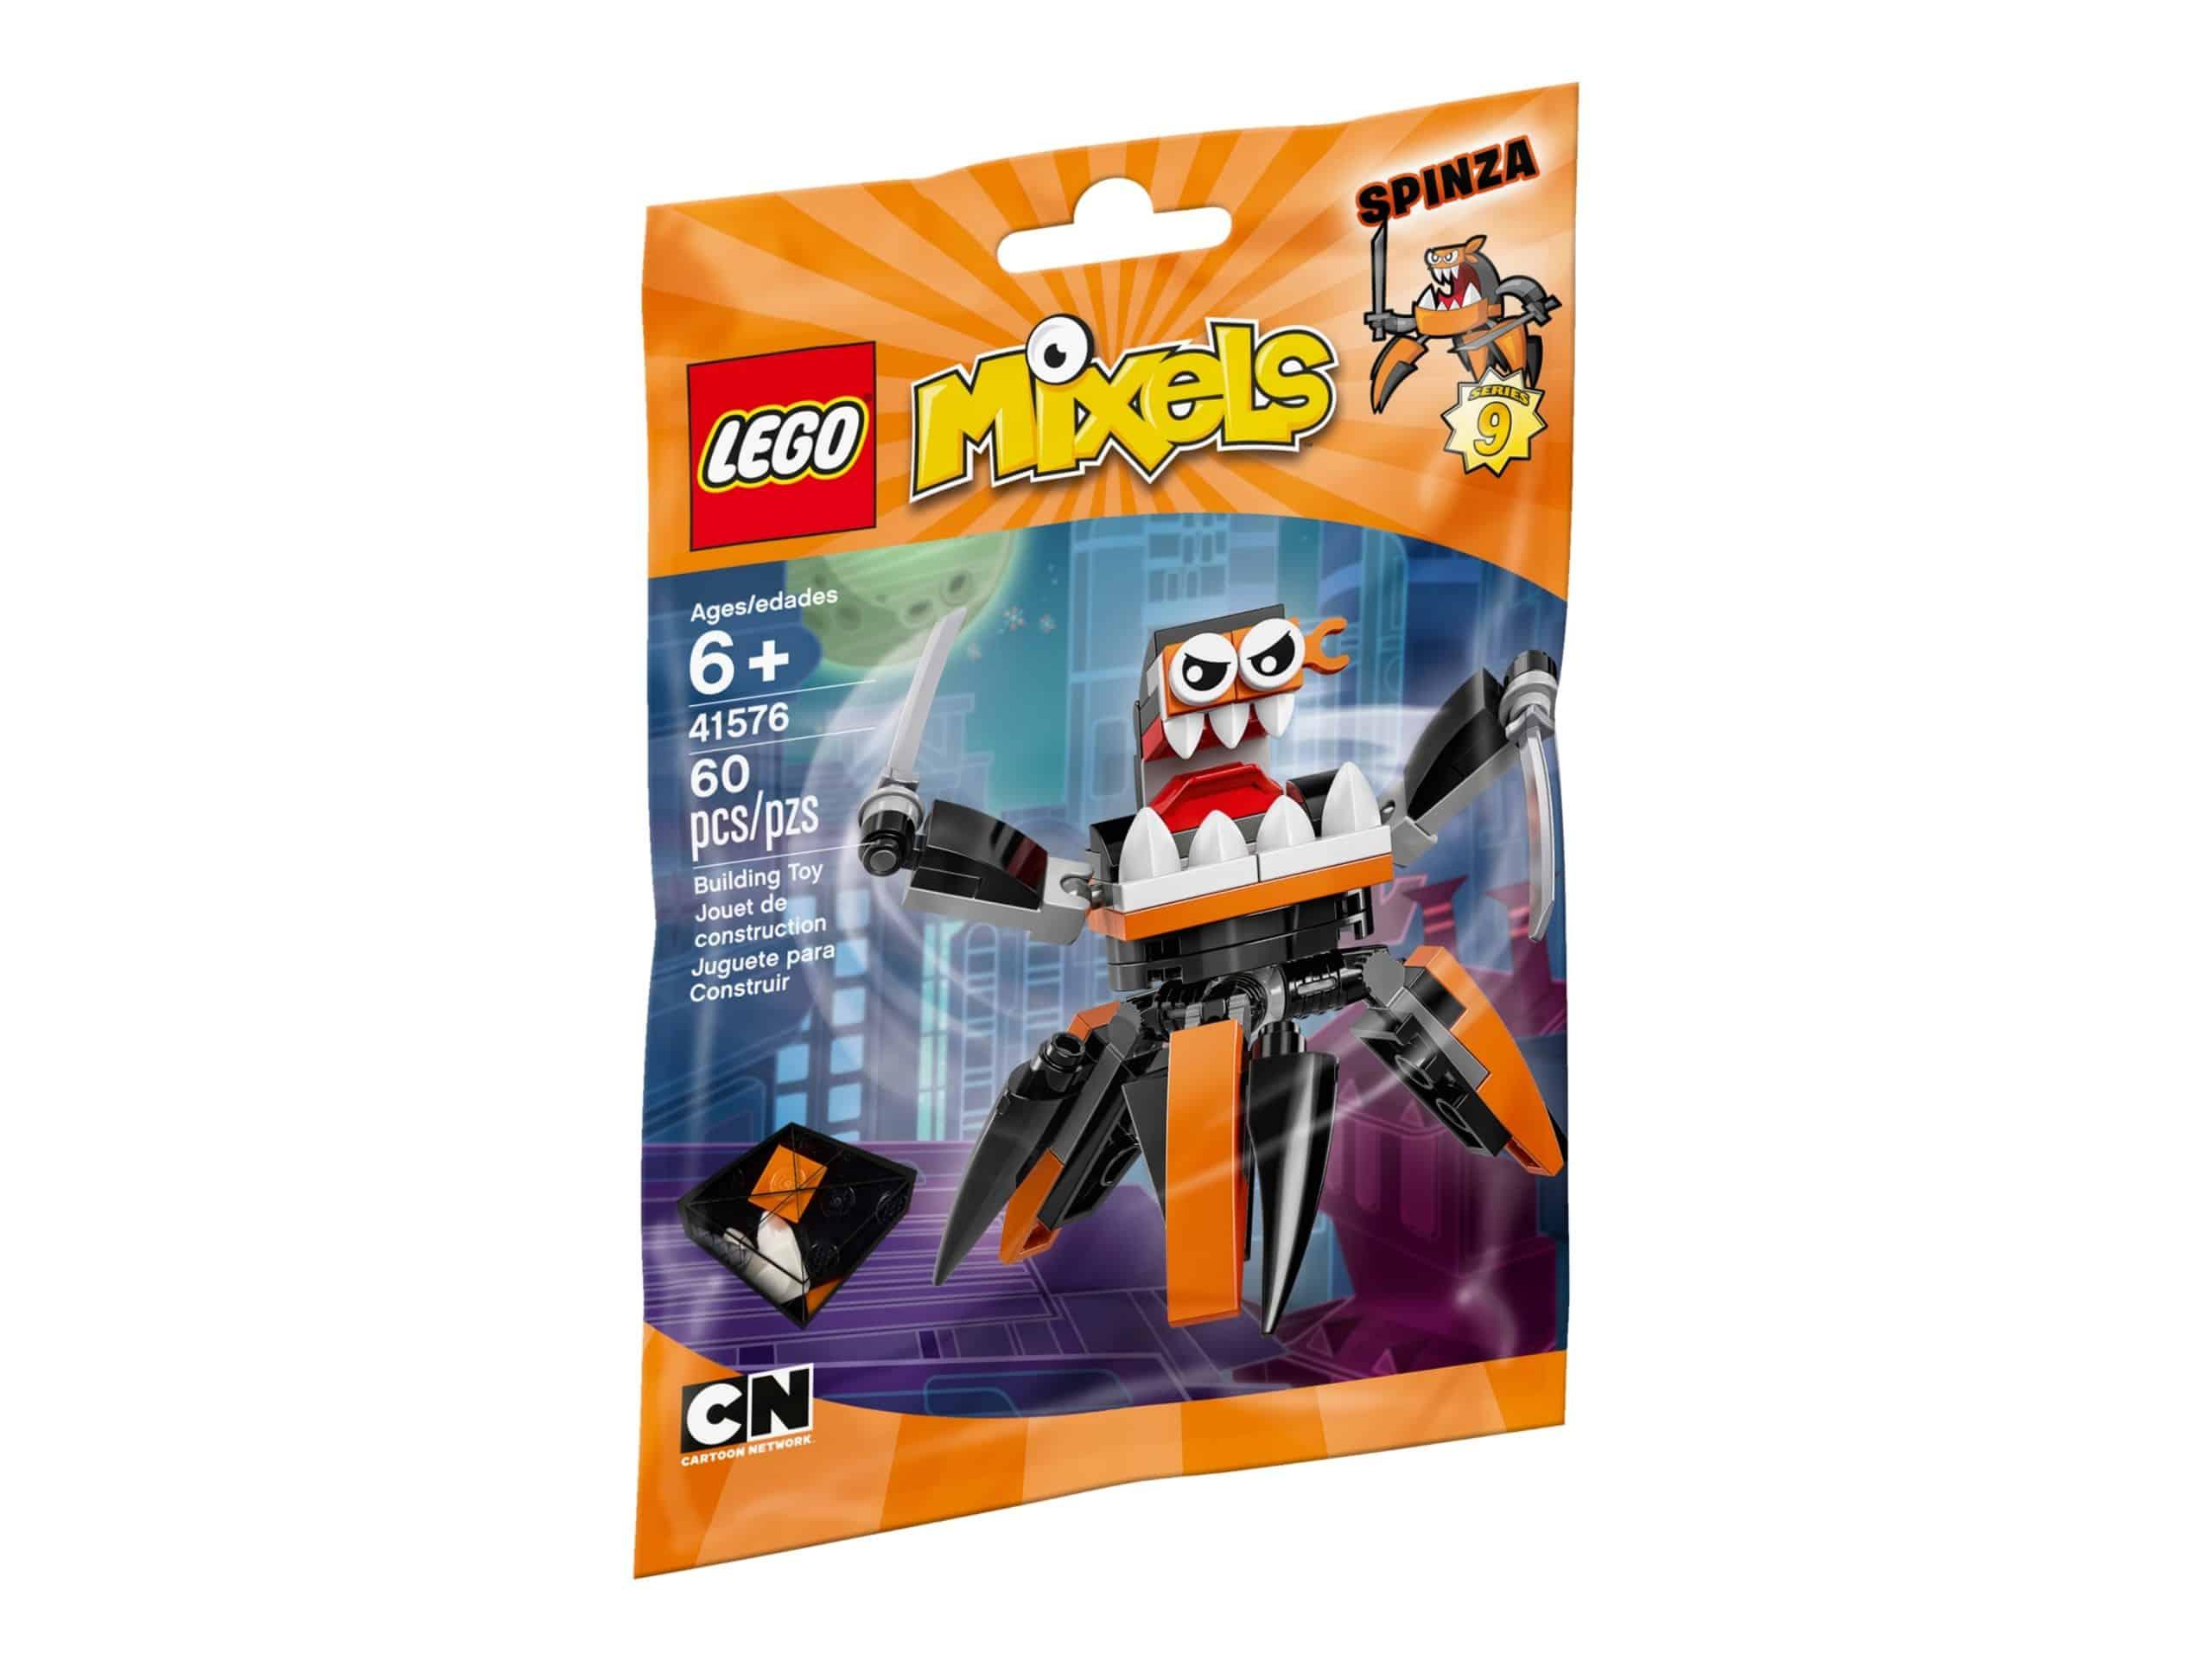 41576 official lego 41576 shop se scaled